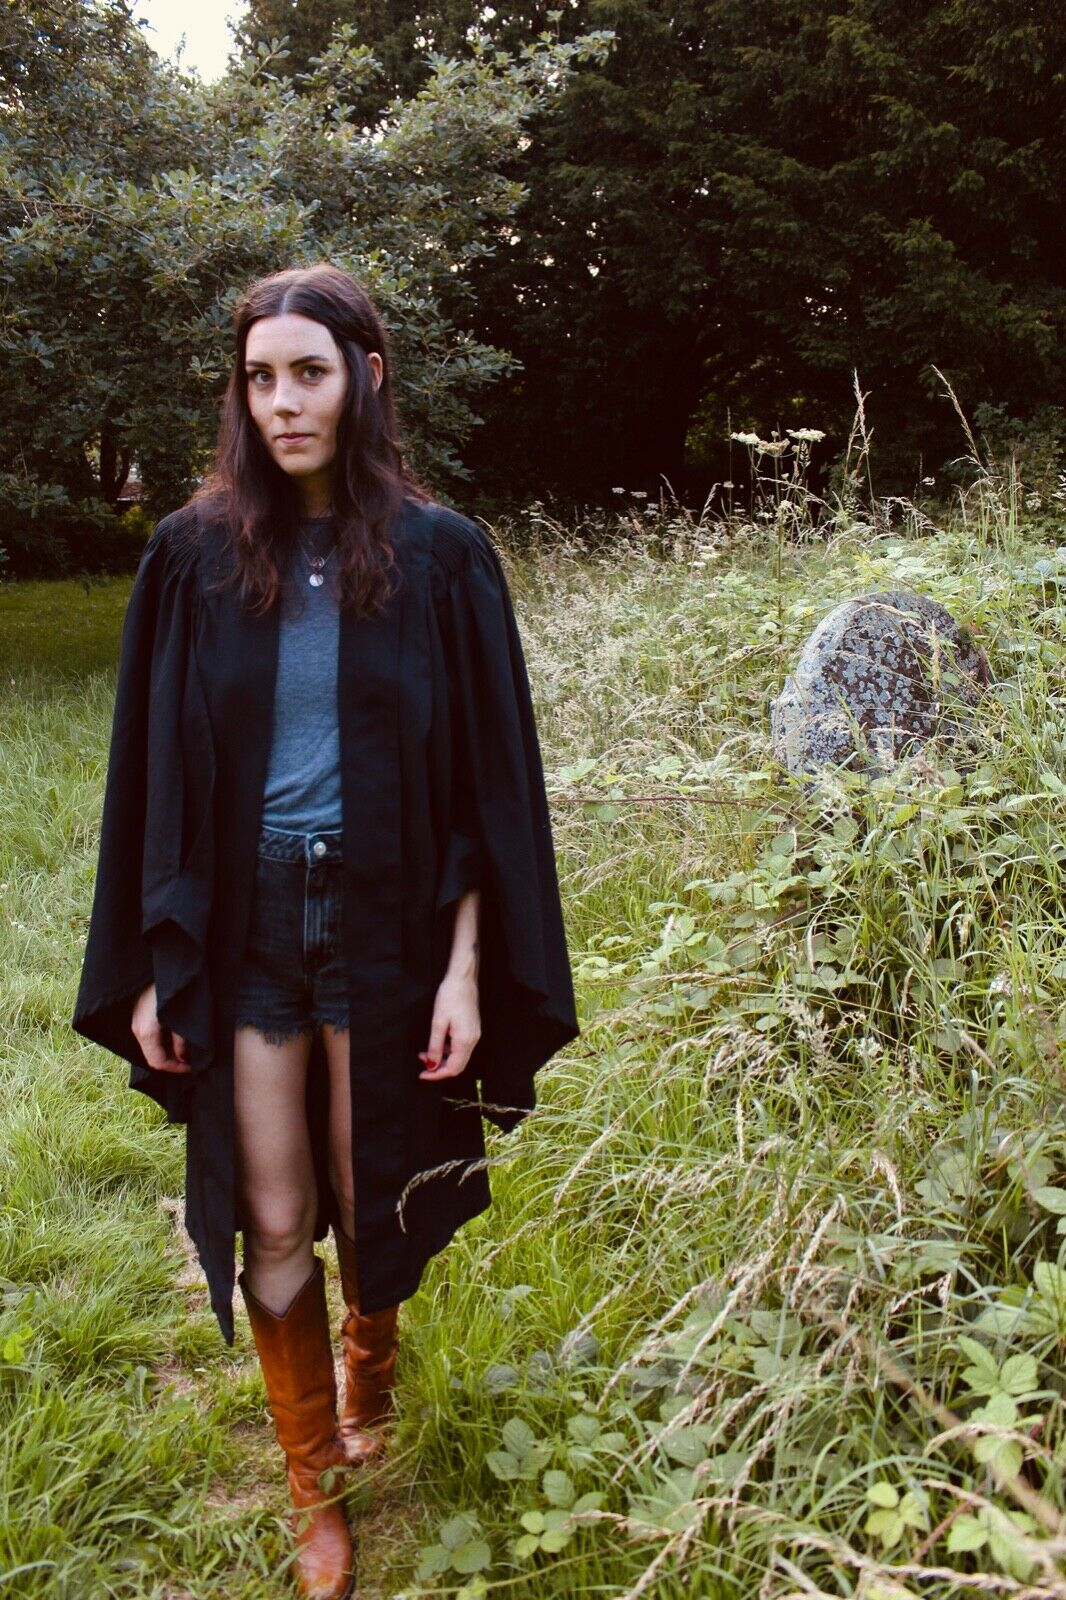 RARE Vintage 1970s Ede and Ravenscroft Graduate Robe - Gothic Robe - Cloak